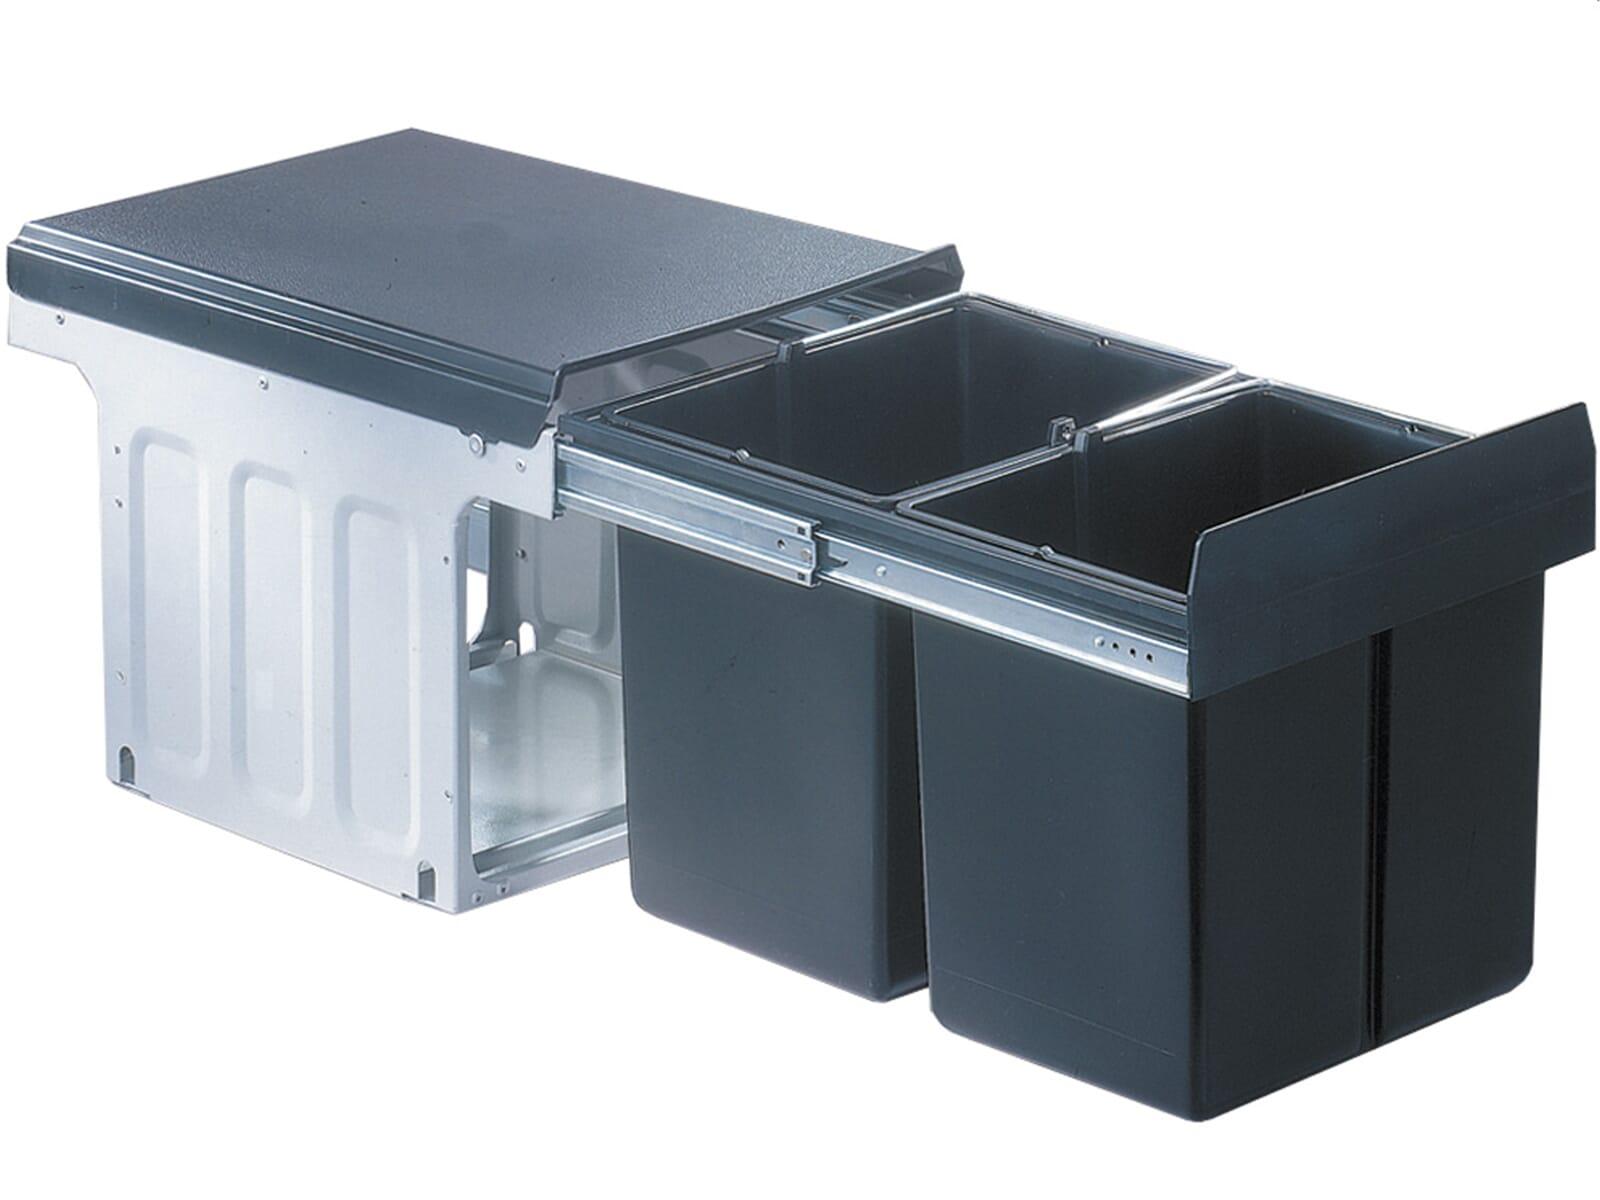 Teka Double-Master 40.1 DT Einbau-Abfallsammler